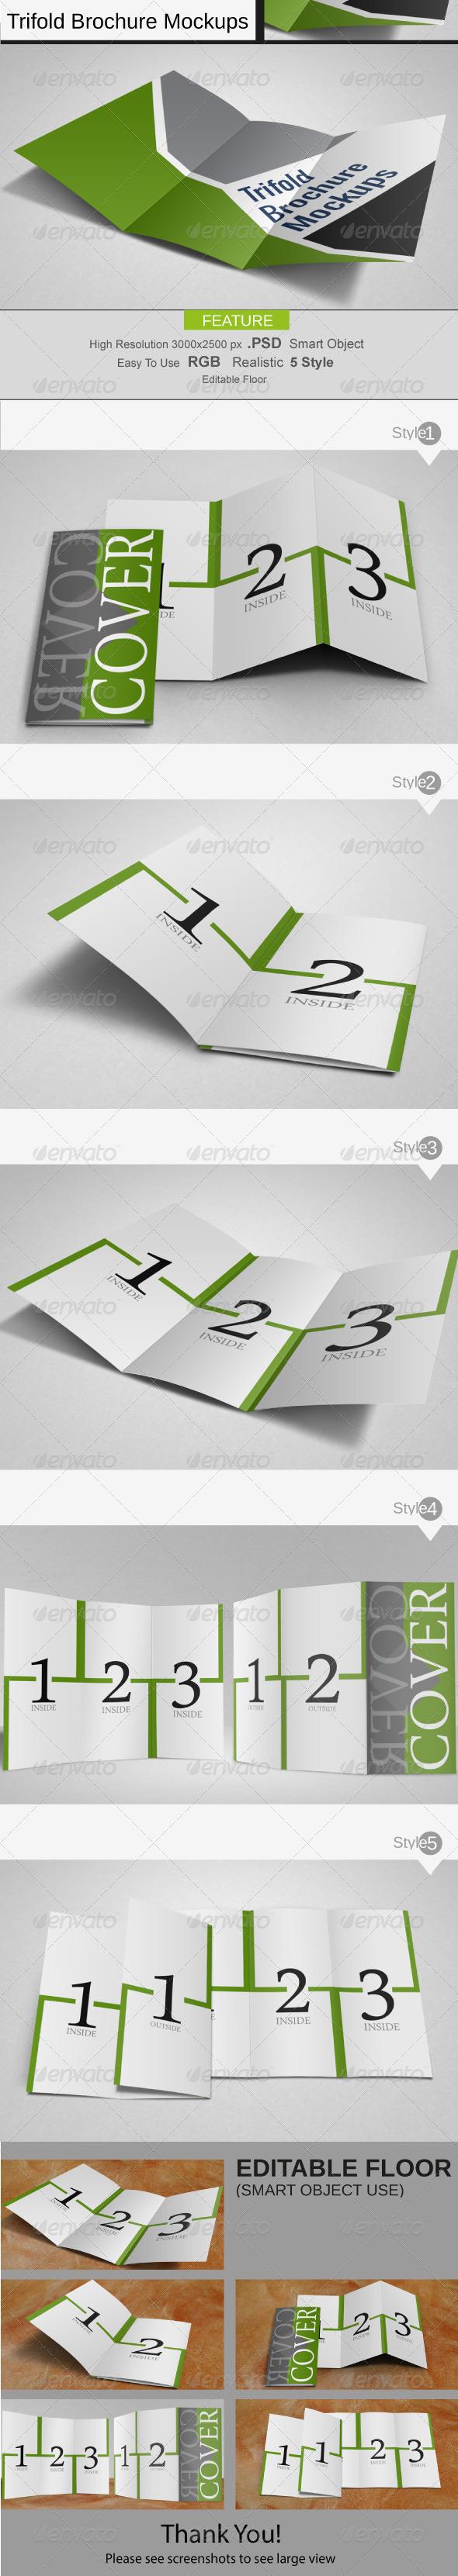 Trifold Brochure Mockups - Print Product Mock-Ups